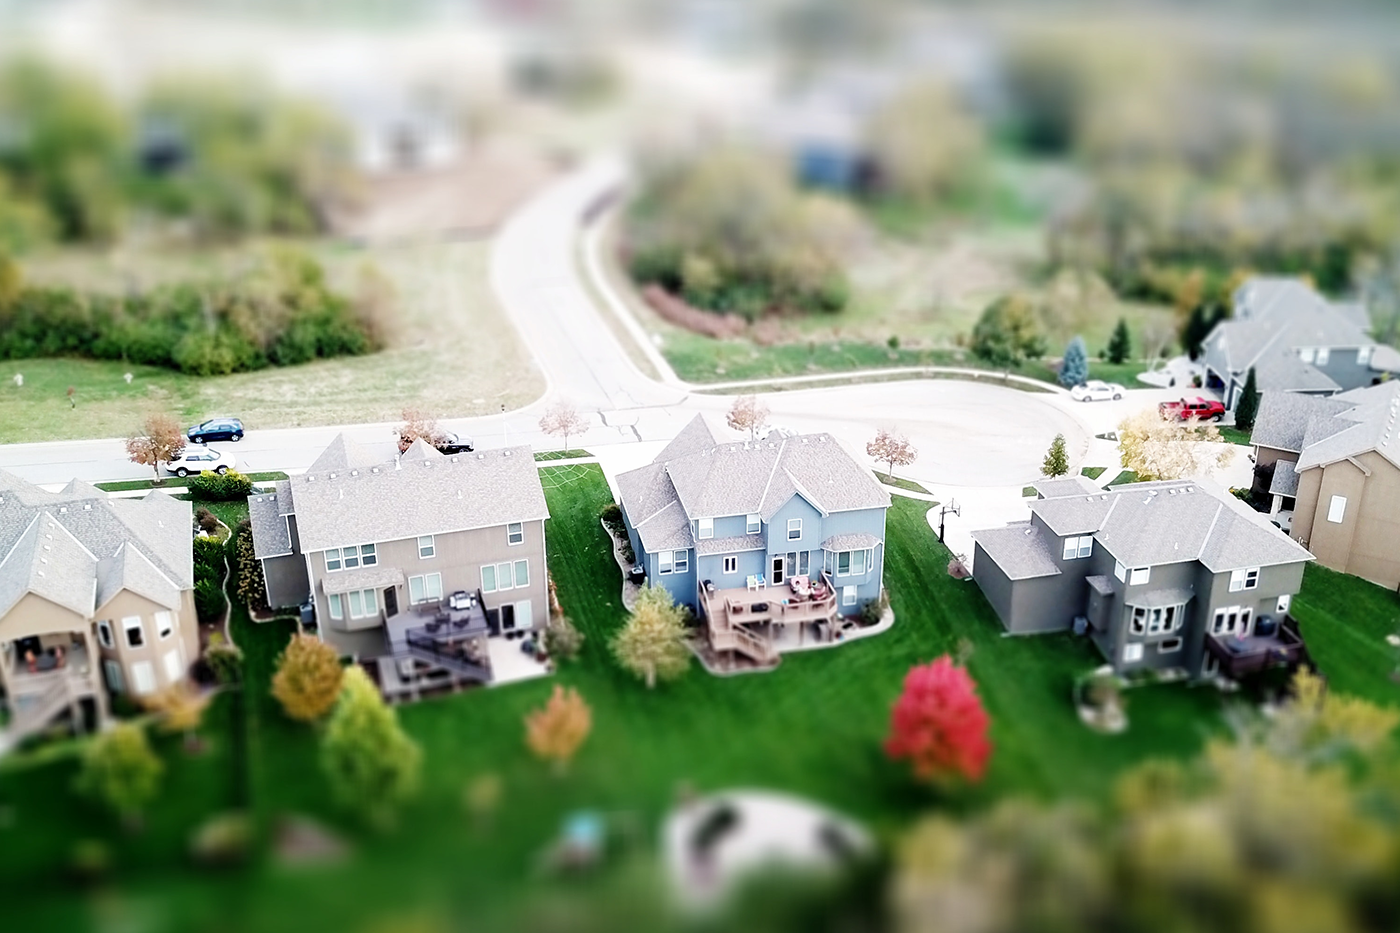 State of Hispanic Homeownership